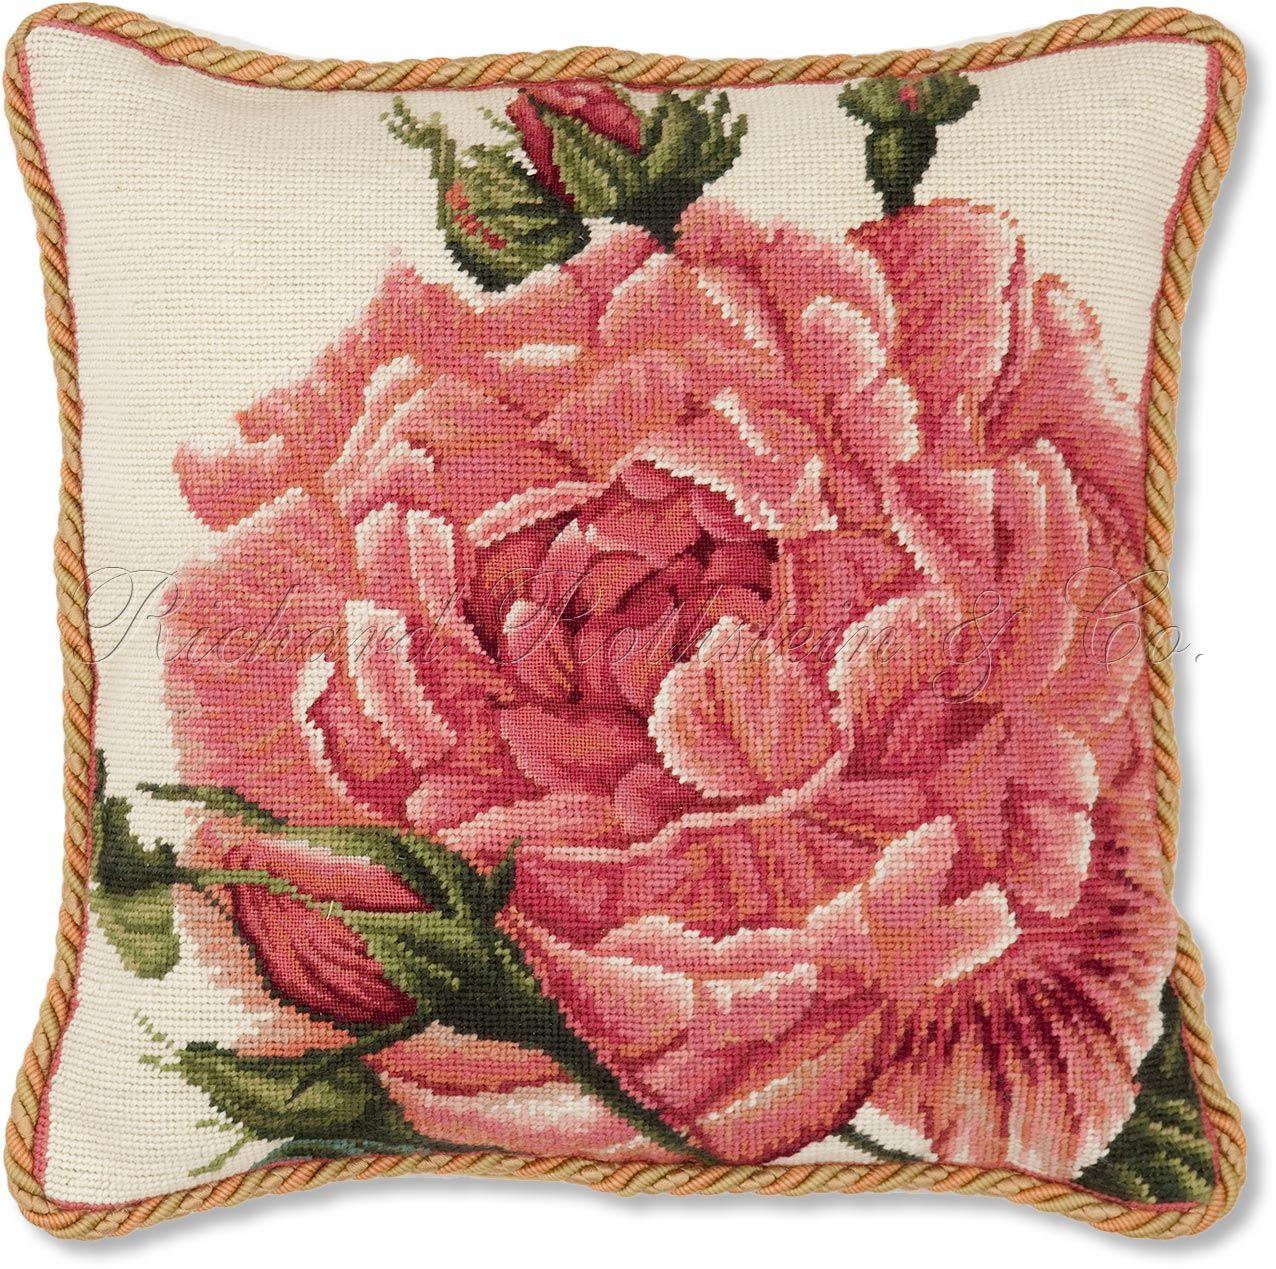 Rose Needlepoint Throw Pillow Royal Blush Rose Needlepoint Pillow